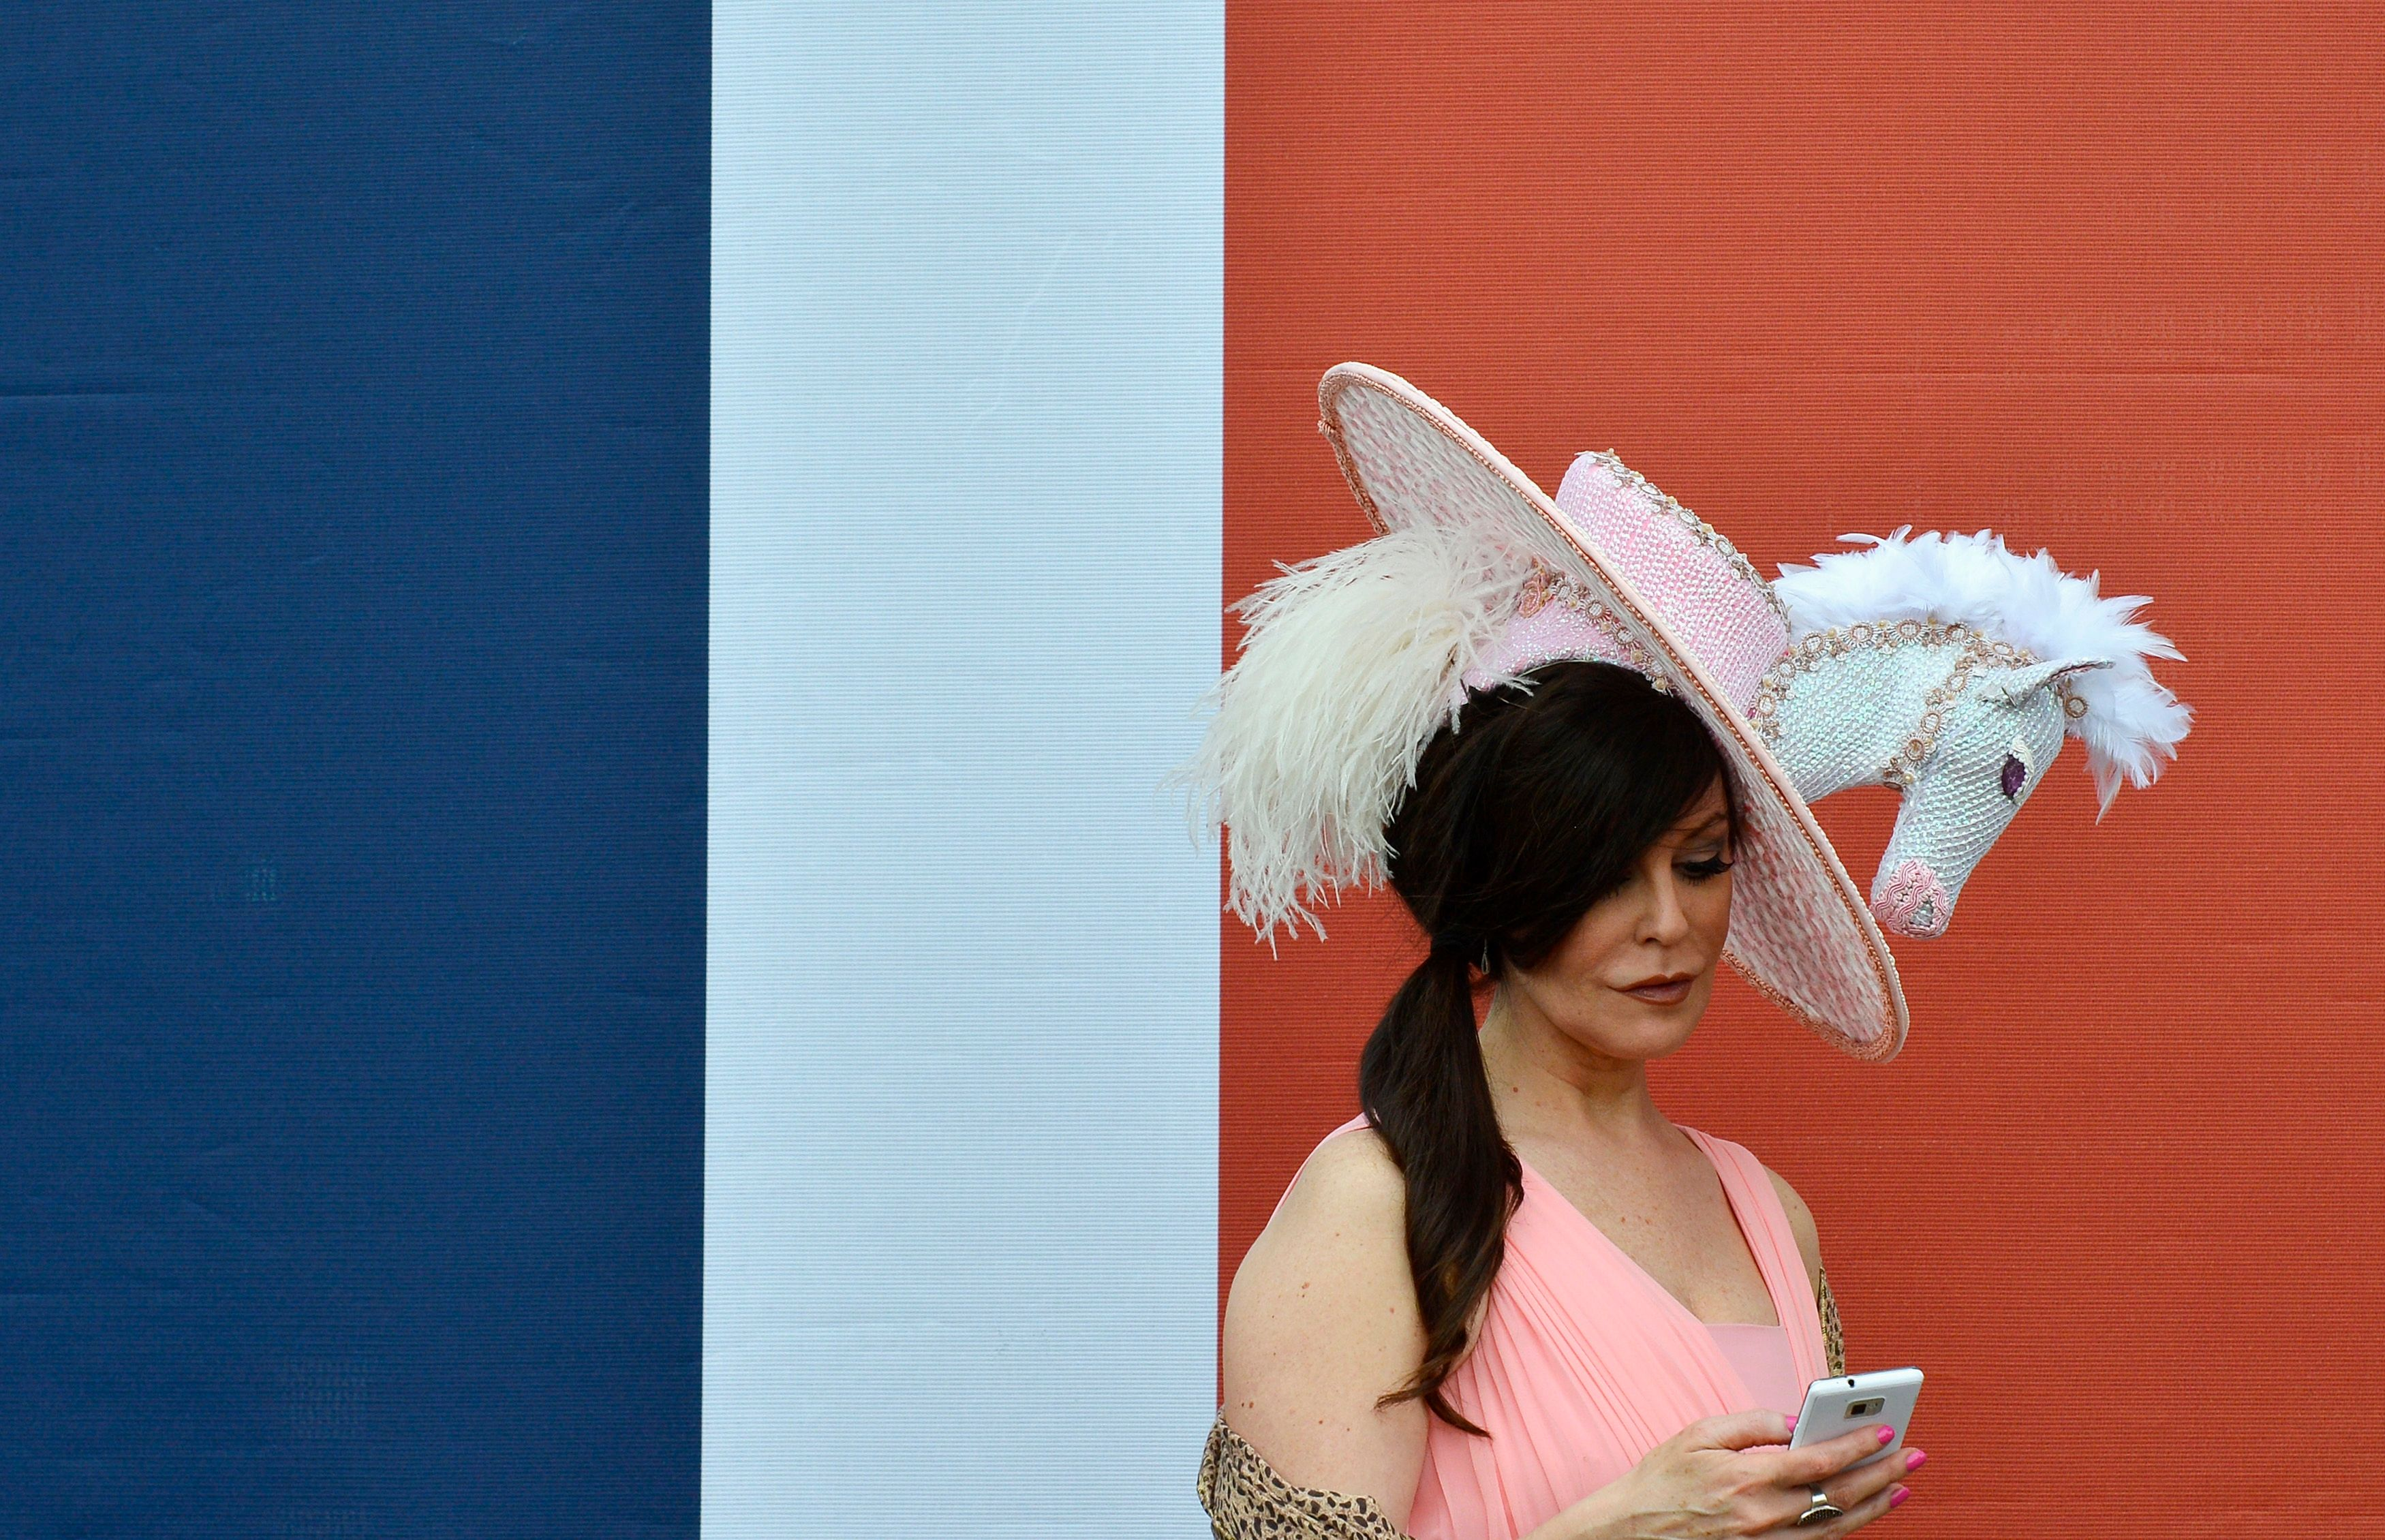 En 2014, de nouvelles formes de rentes sont apparues en France.